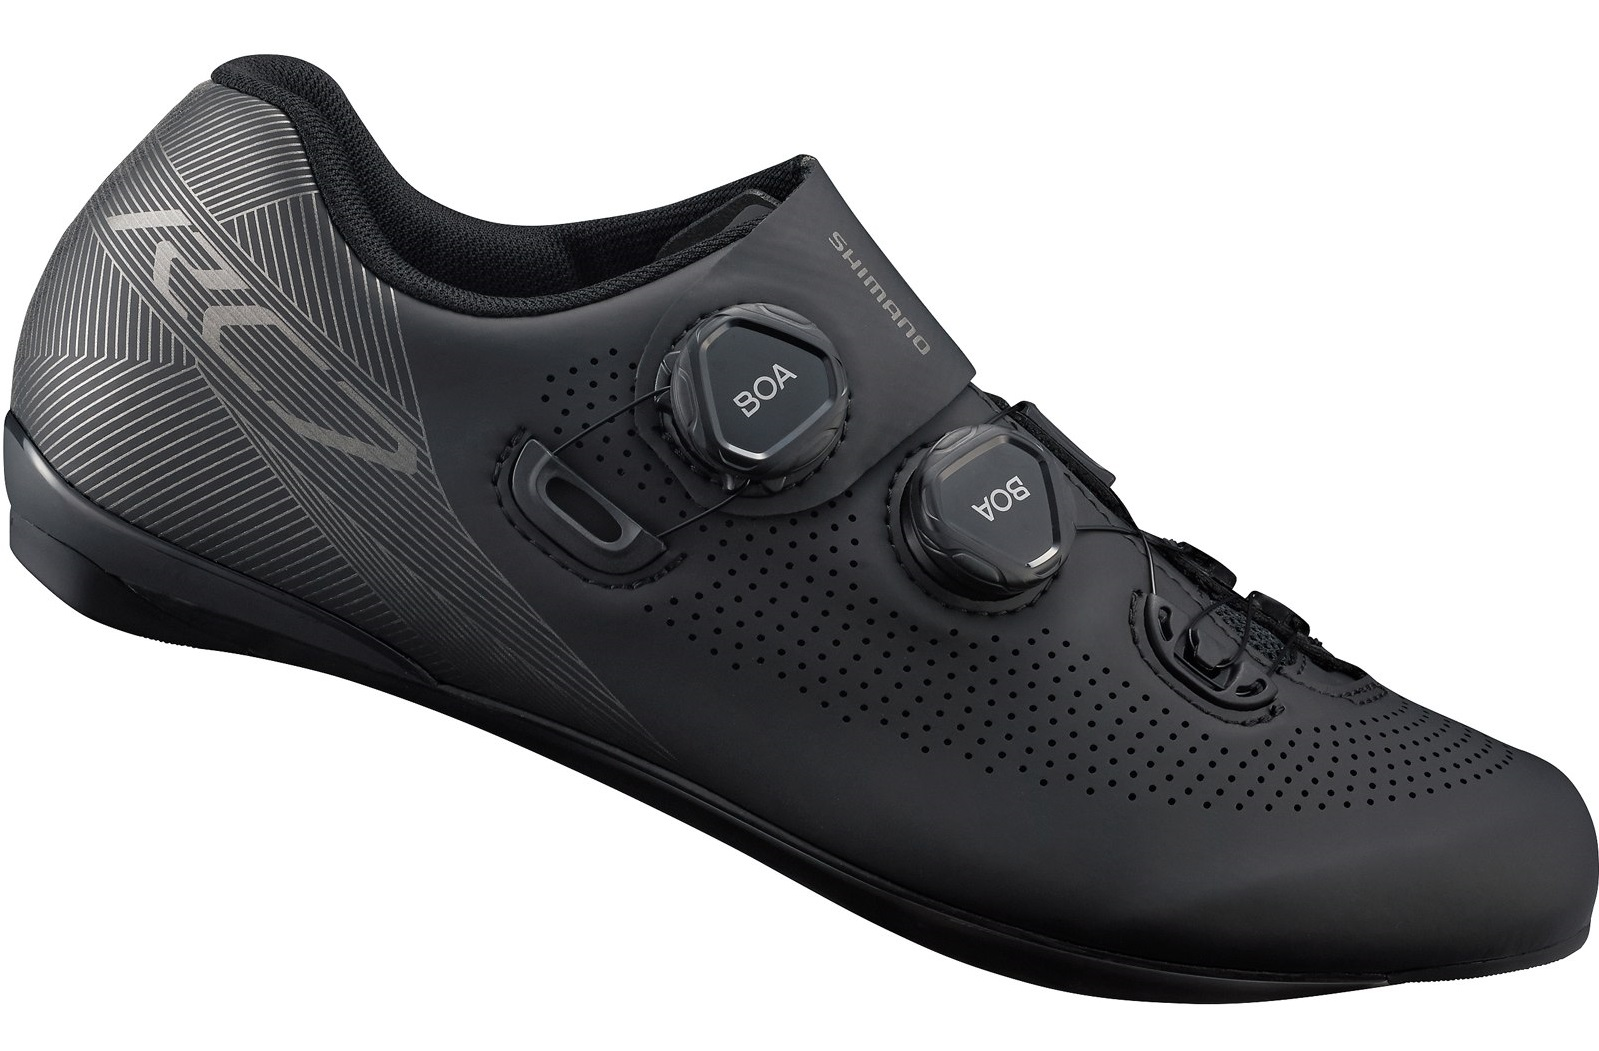 Čevlji shimano sh-rc7 (sh-rc701) black